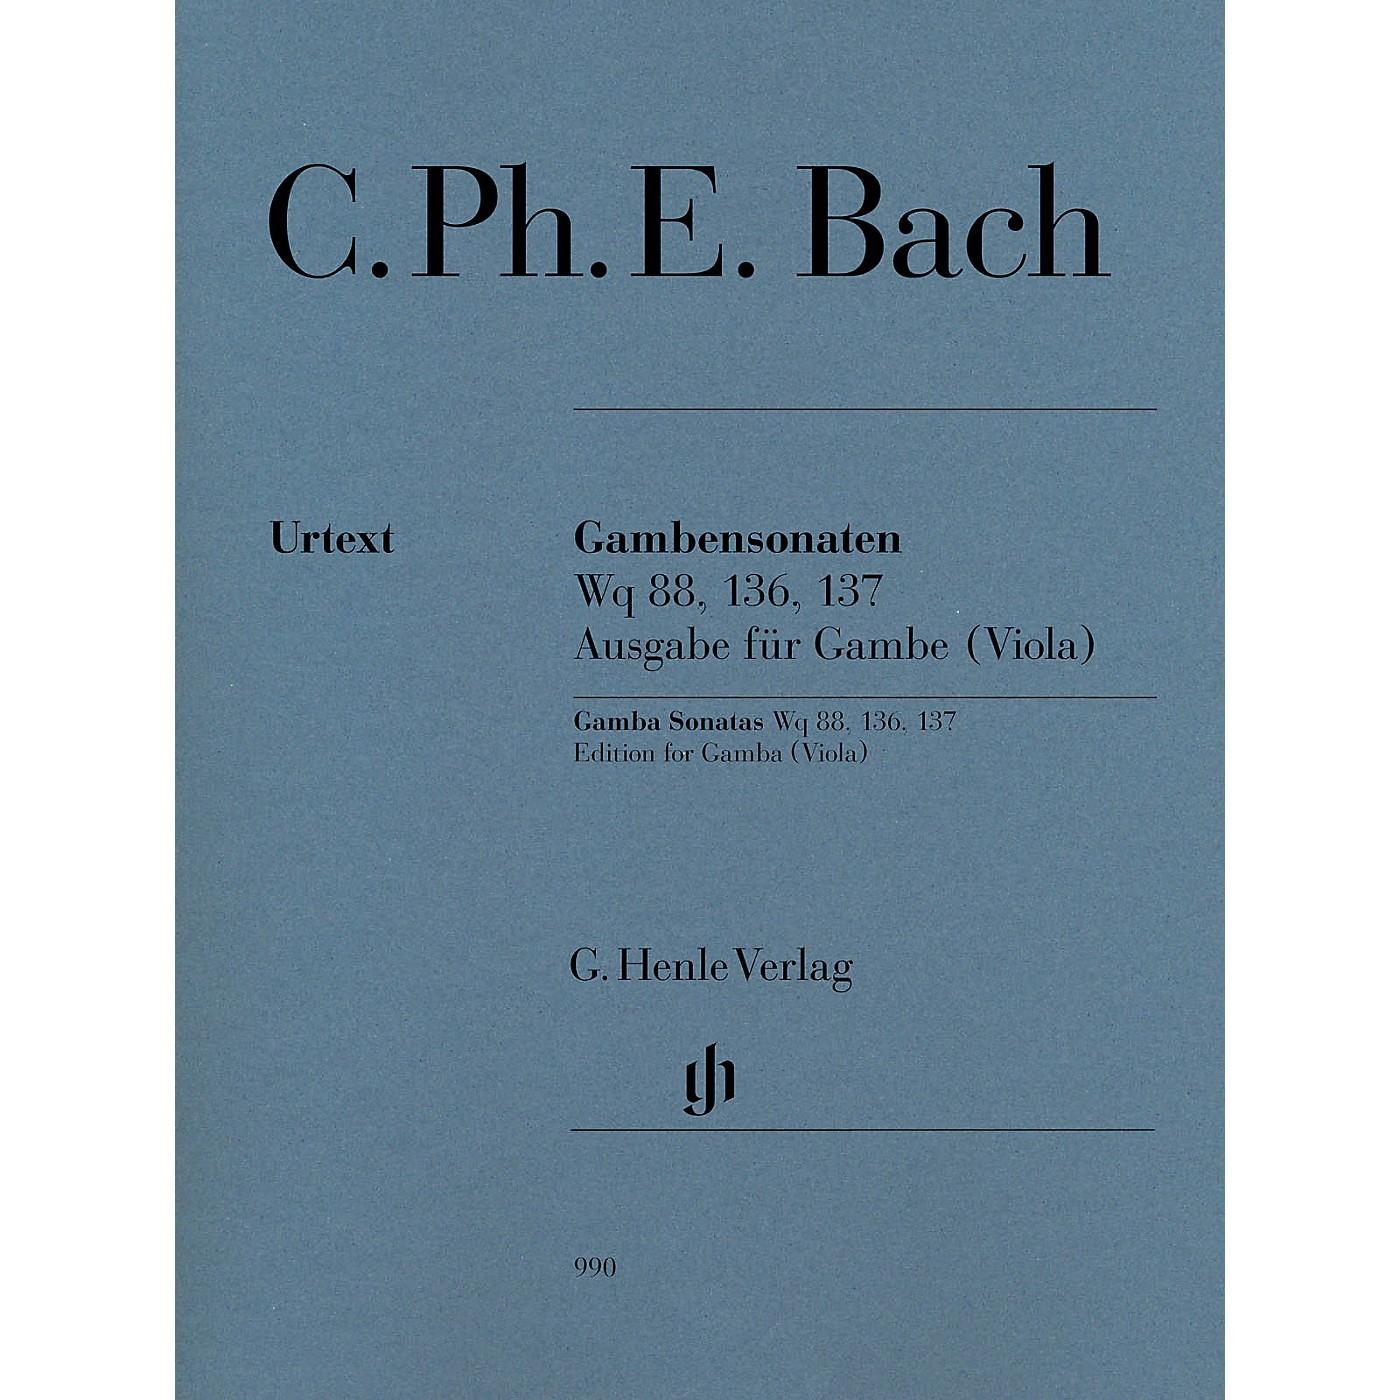 G. Henle Verlag Gamba Sonatas, Wq 88, 136, 137 by Carl Philipp Emanuel Bach Edited by Ernst-Gunter Heinemann thumbnail